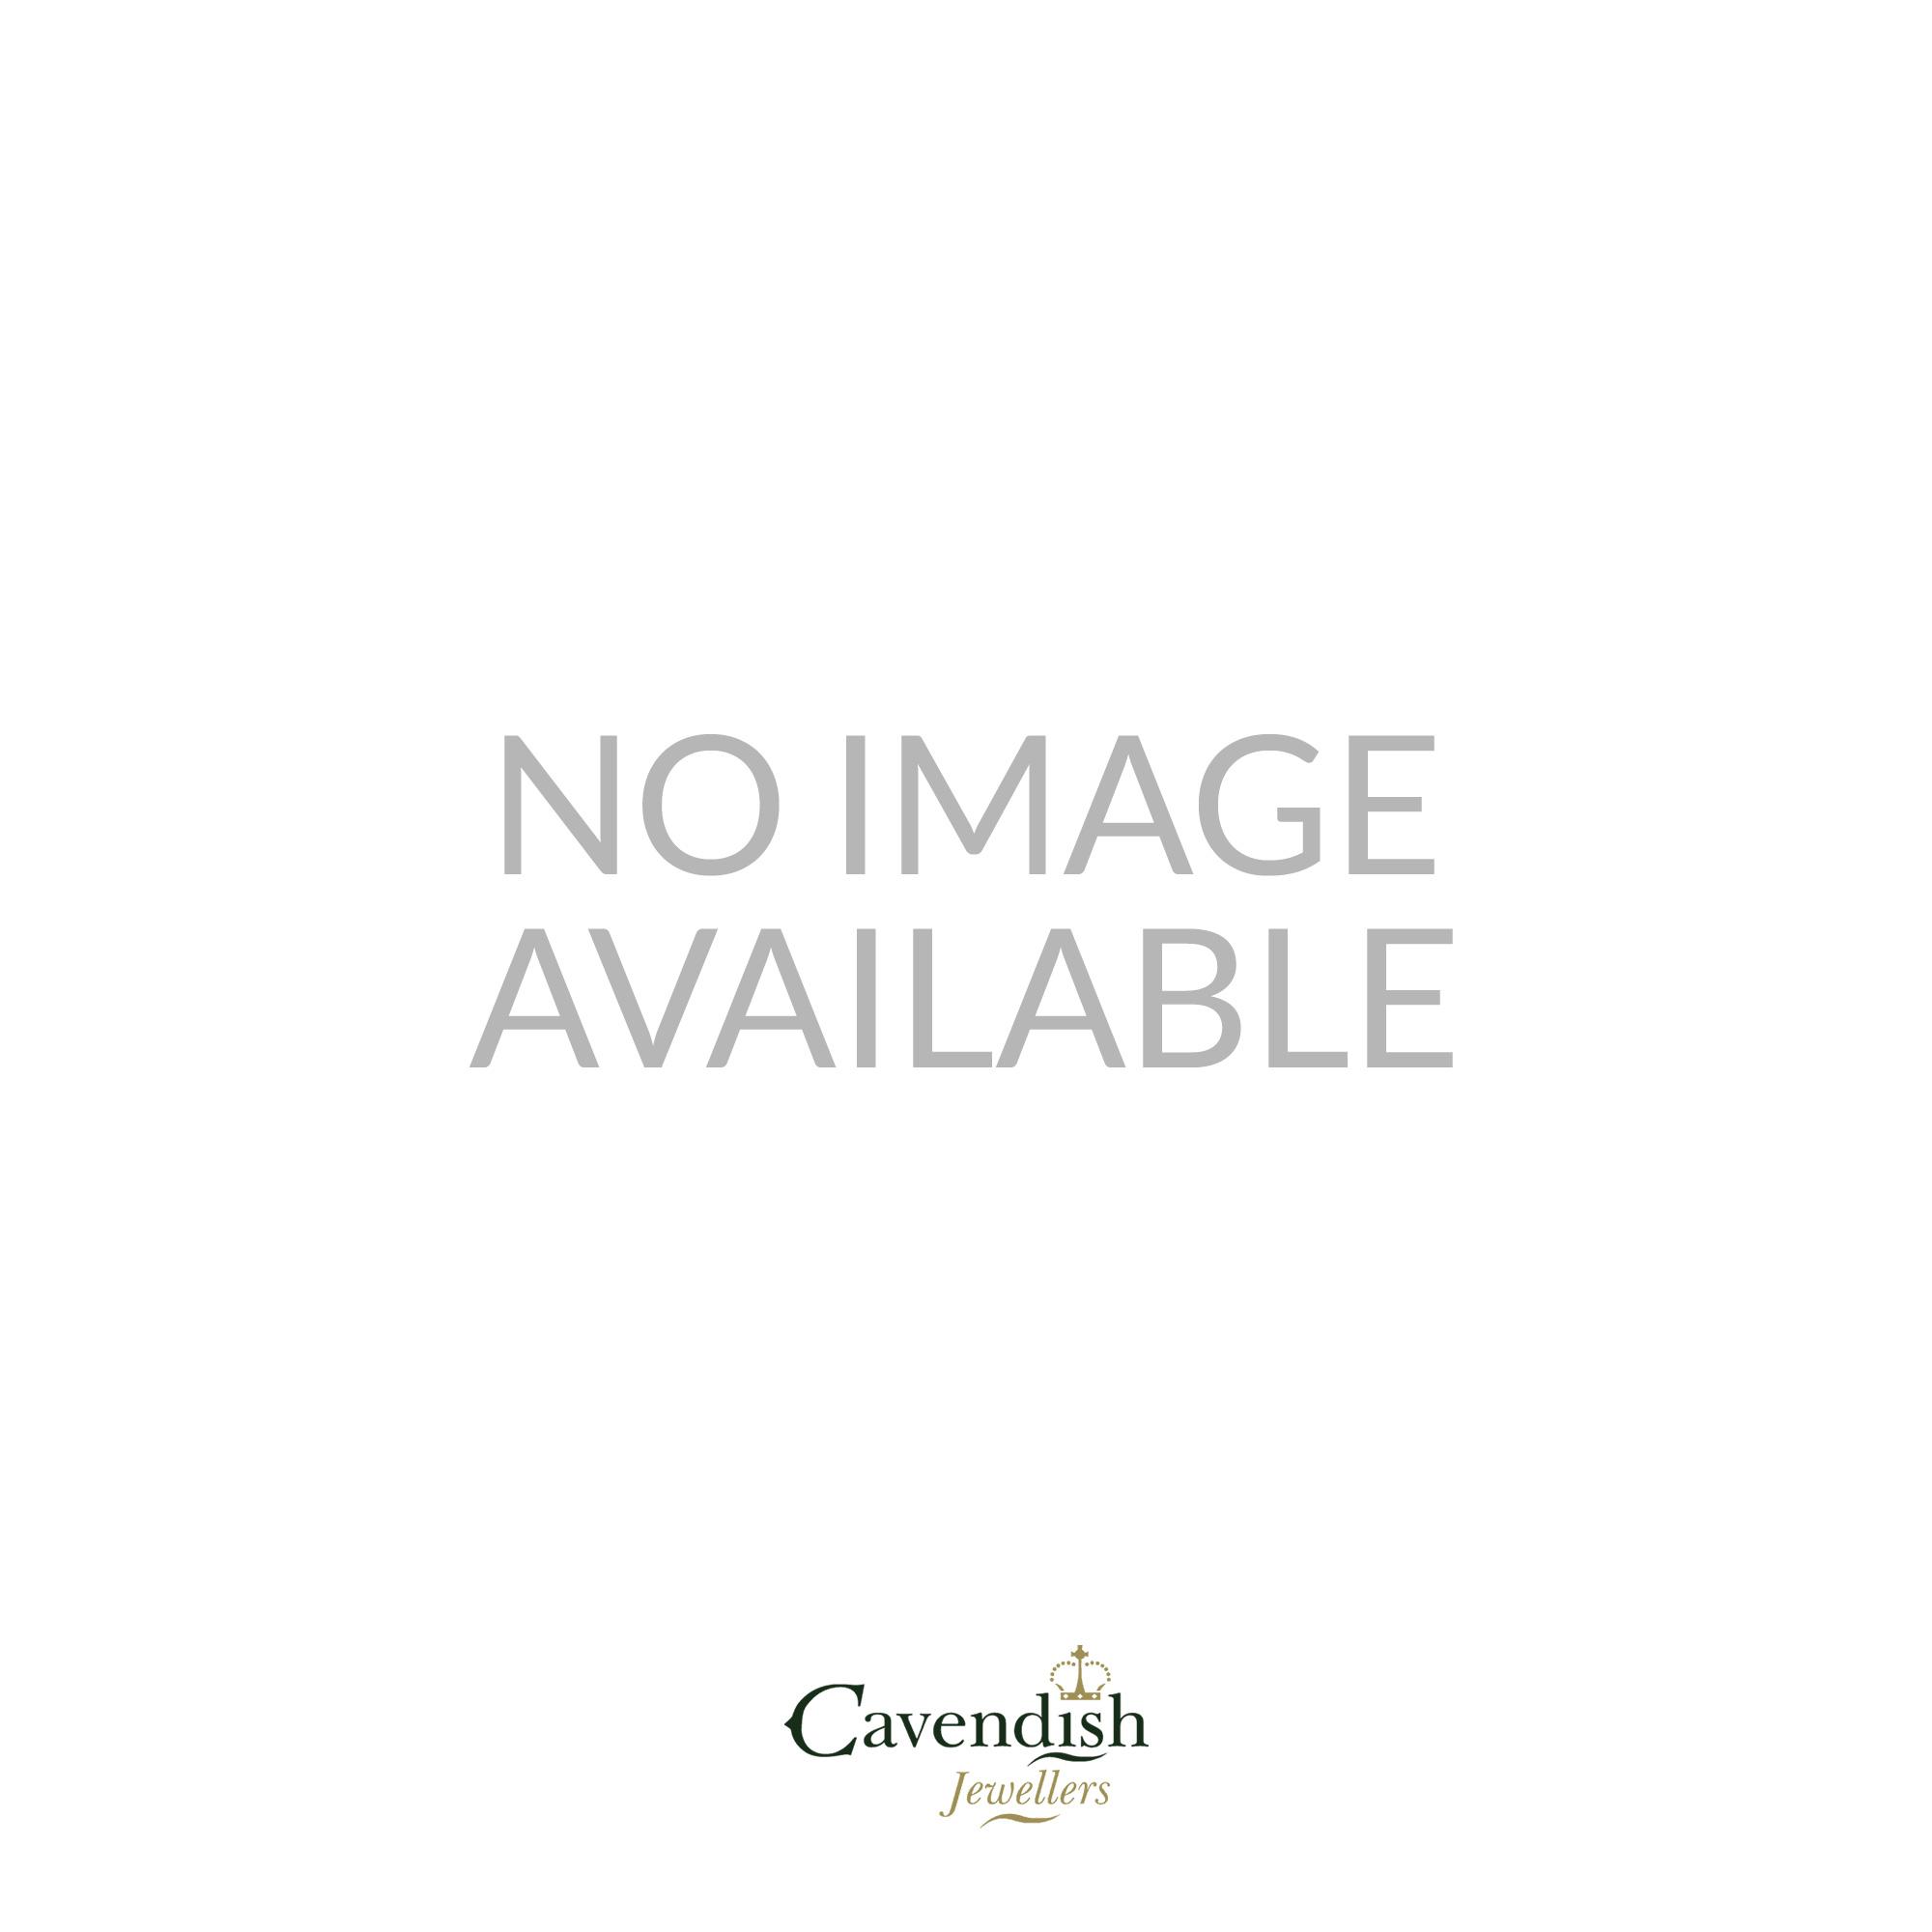 Delightful silver opal onyx marcasite pendant from cavendish delightful silver opal onyx marcasite pendant aloadofball Images